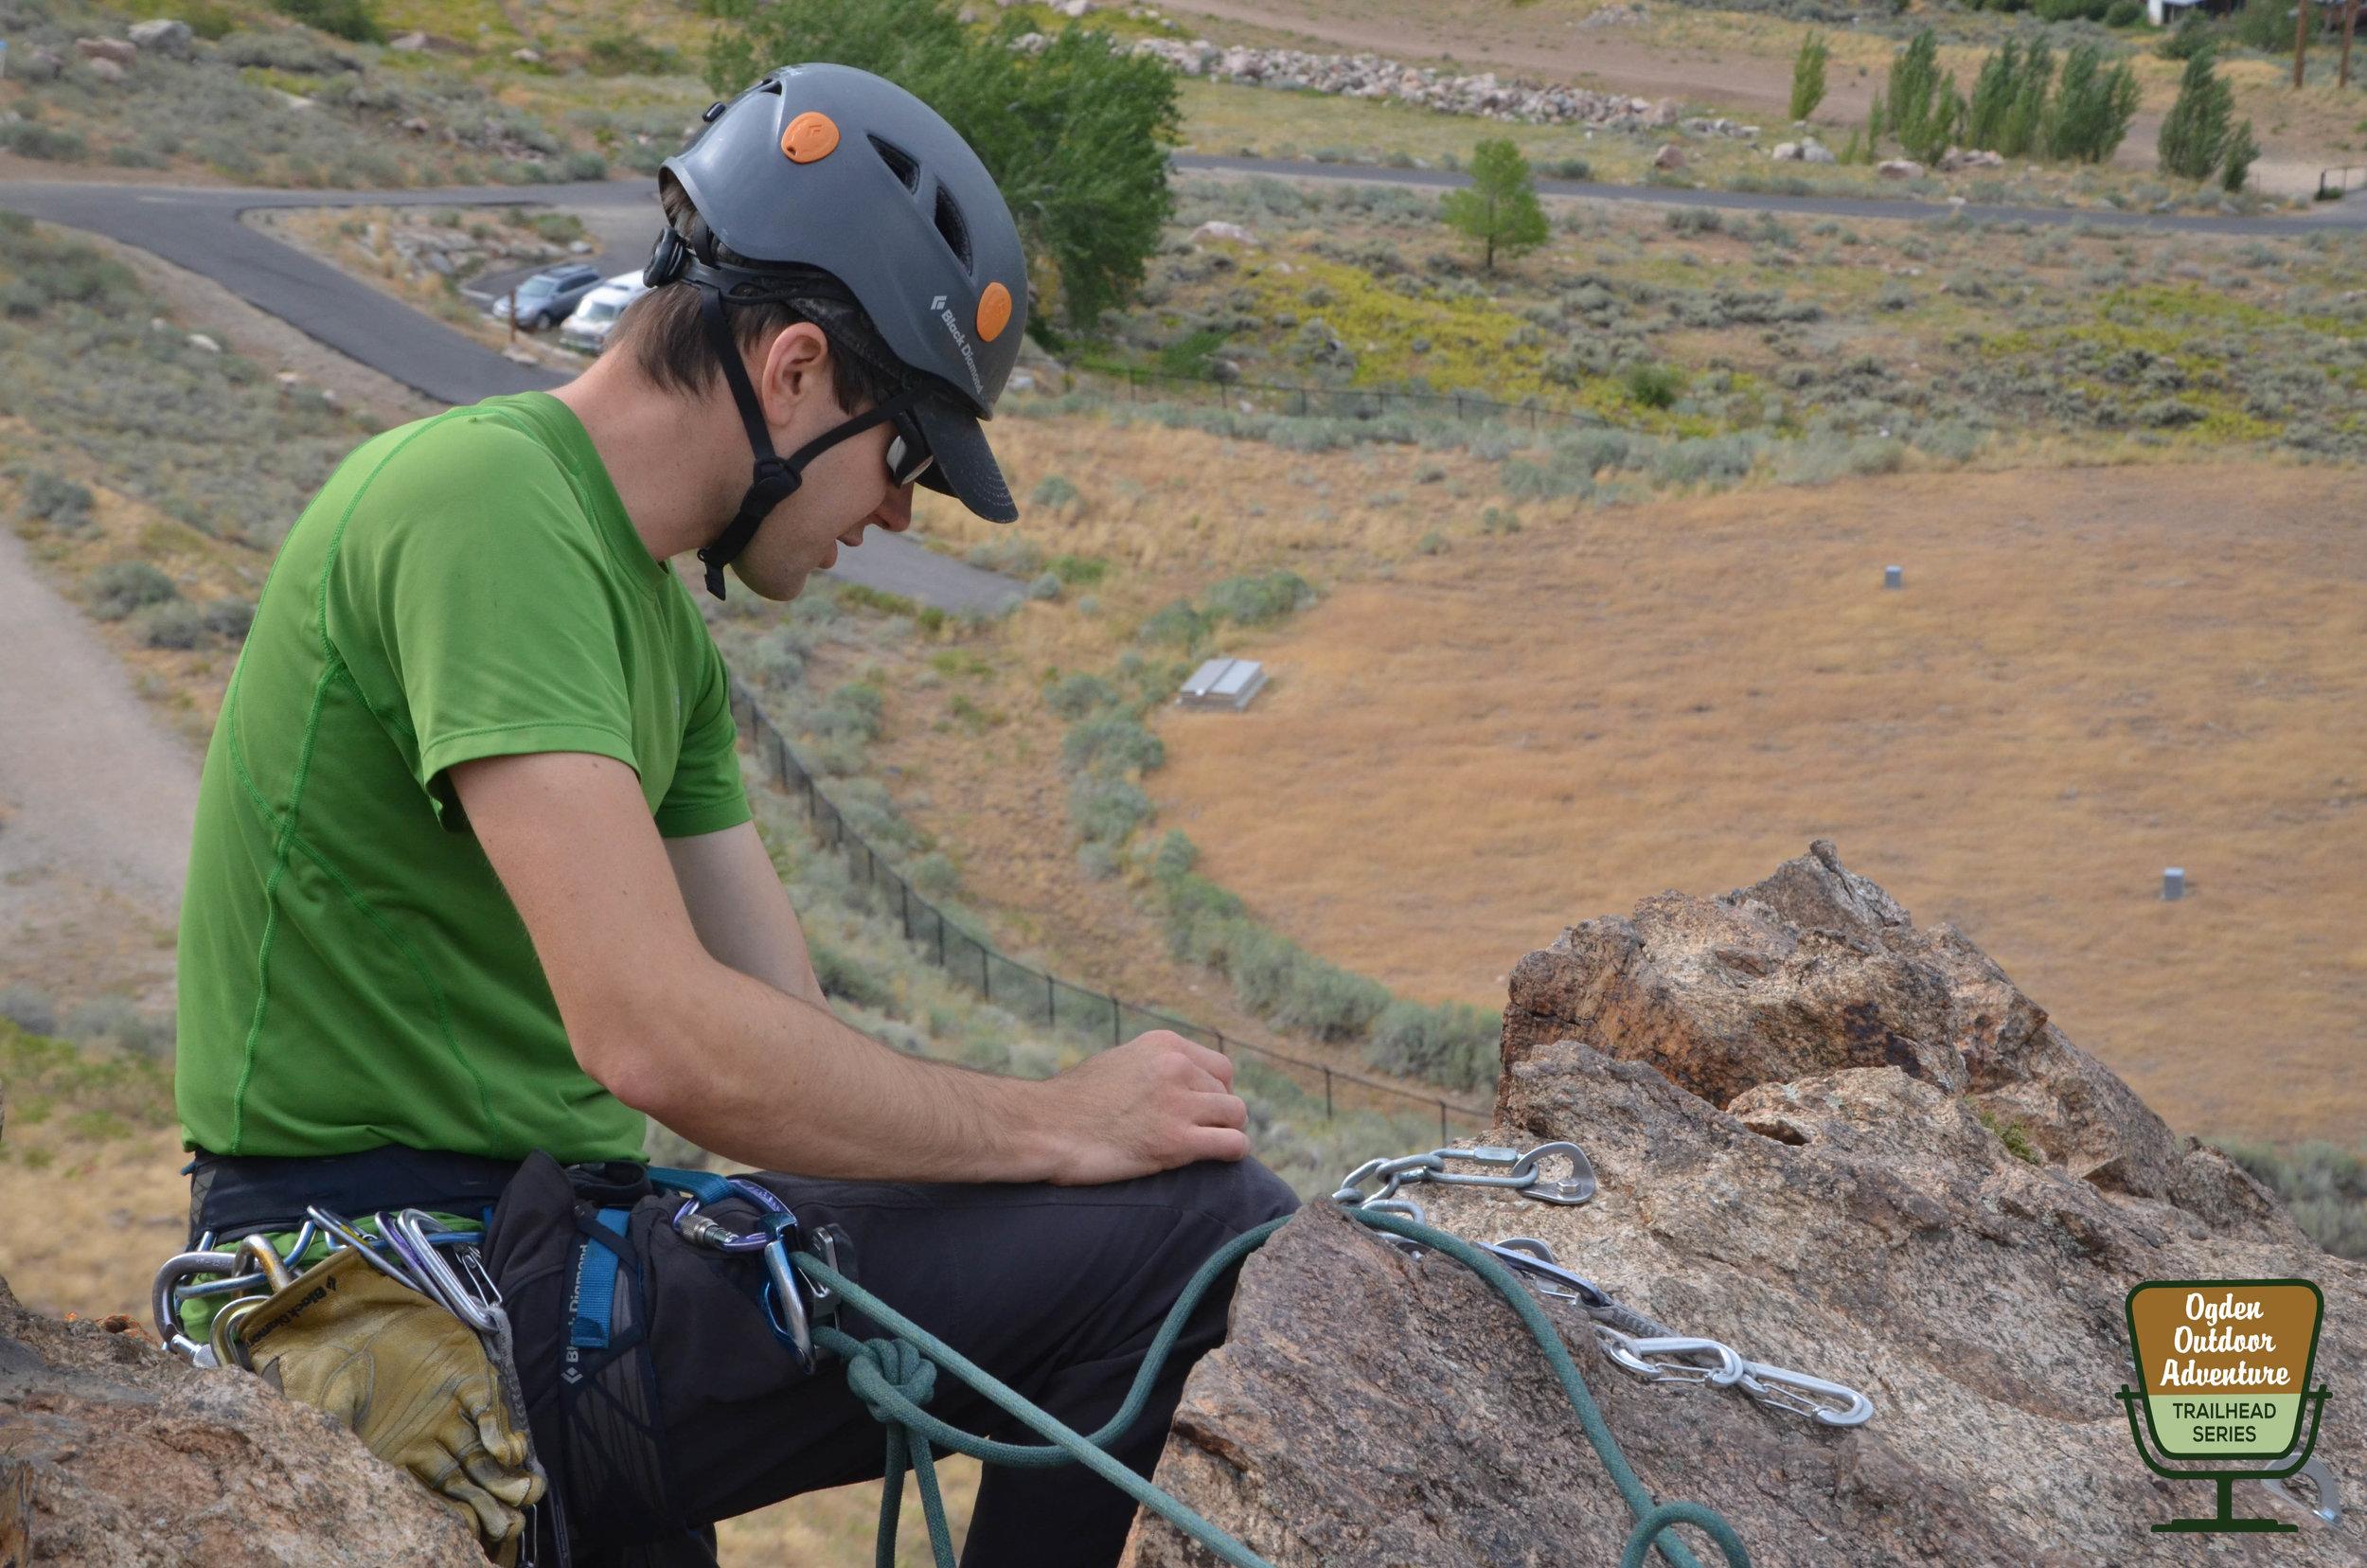 Ogden Outdoor Adventure Show 248 - Bear House Mountaineering-3.jpg